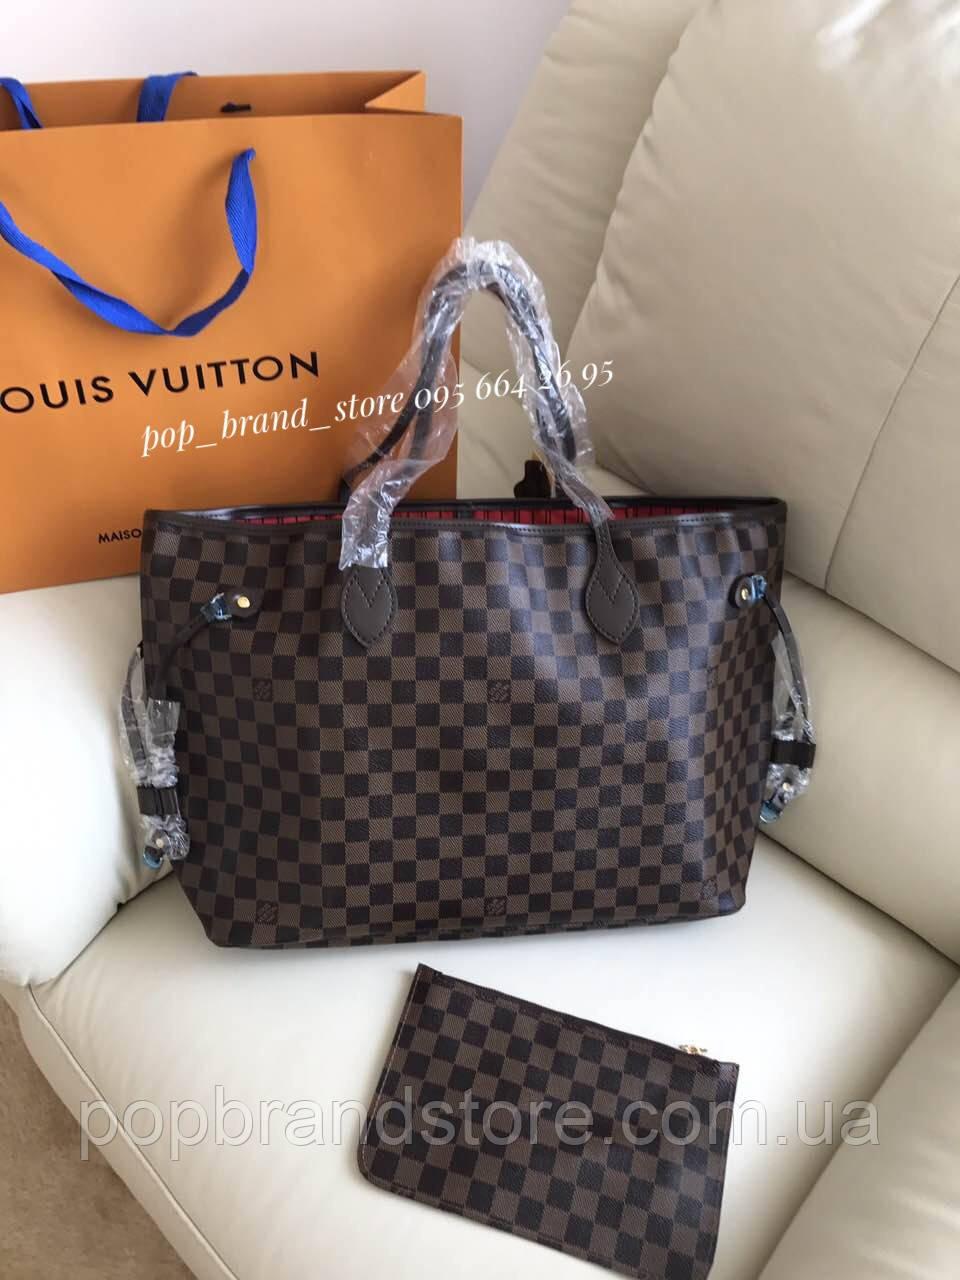 Популярная женская сумка Louis Vuitton Neverfull 40 см (реплика) - Pop  Brand Store   85f172441d1